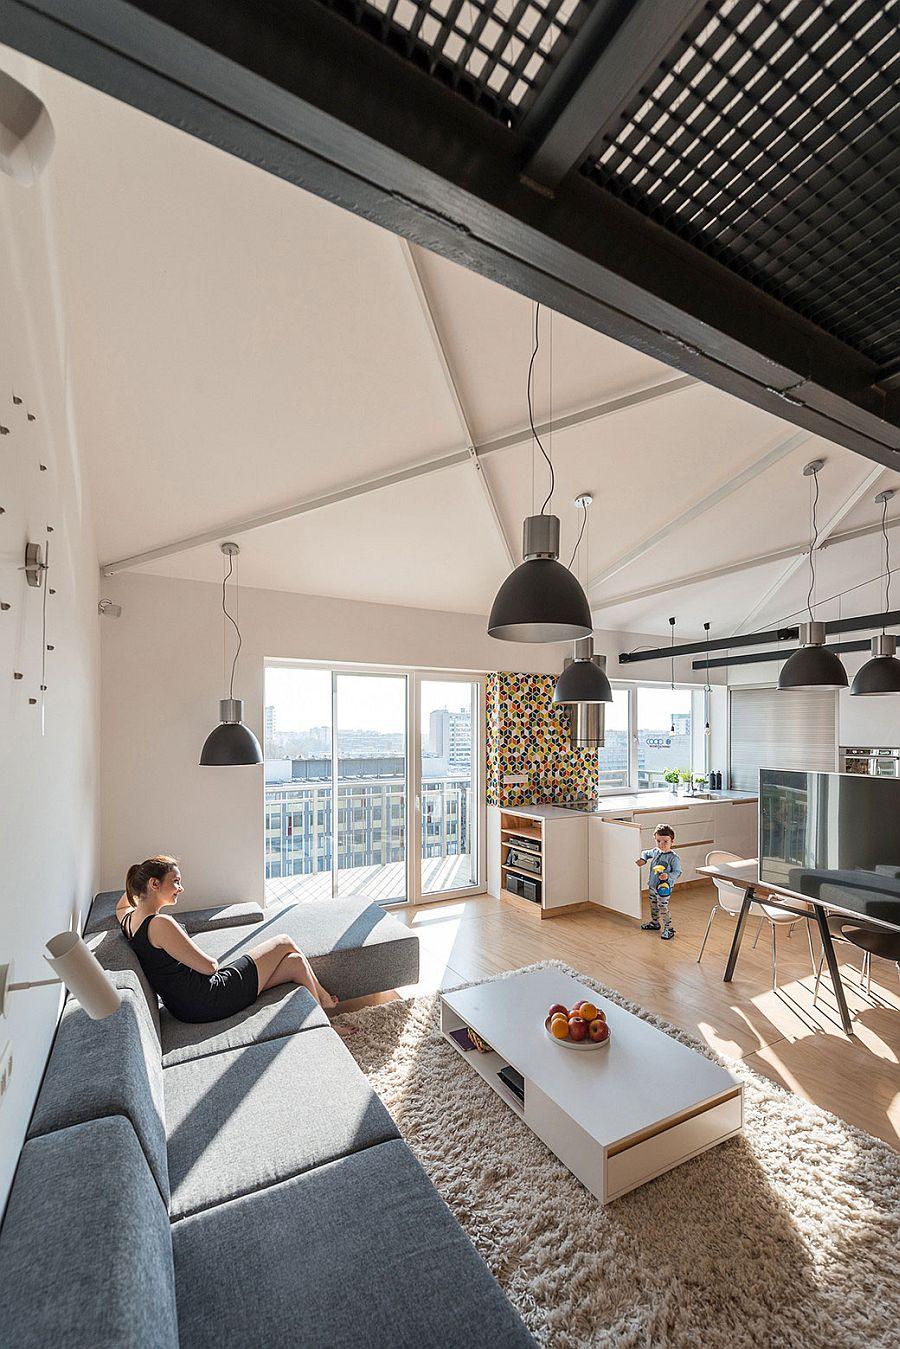 Modern Industrial Loft Apartment In Bratislava Showcases